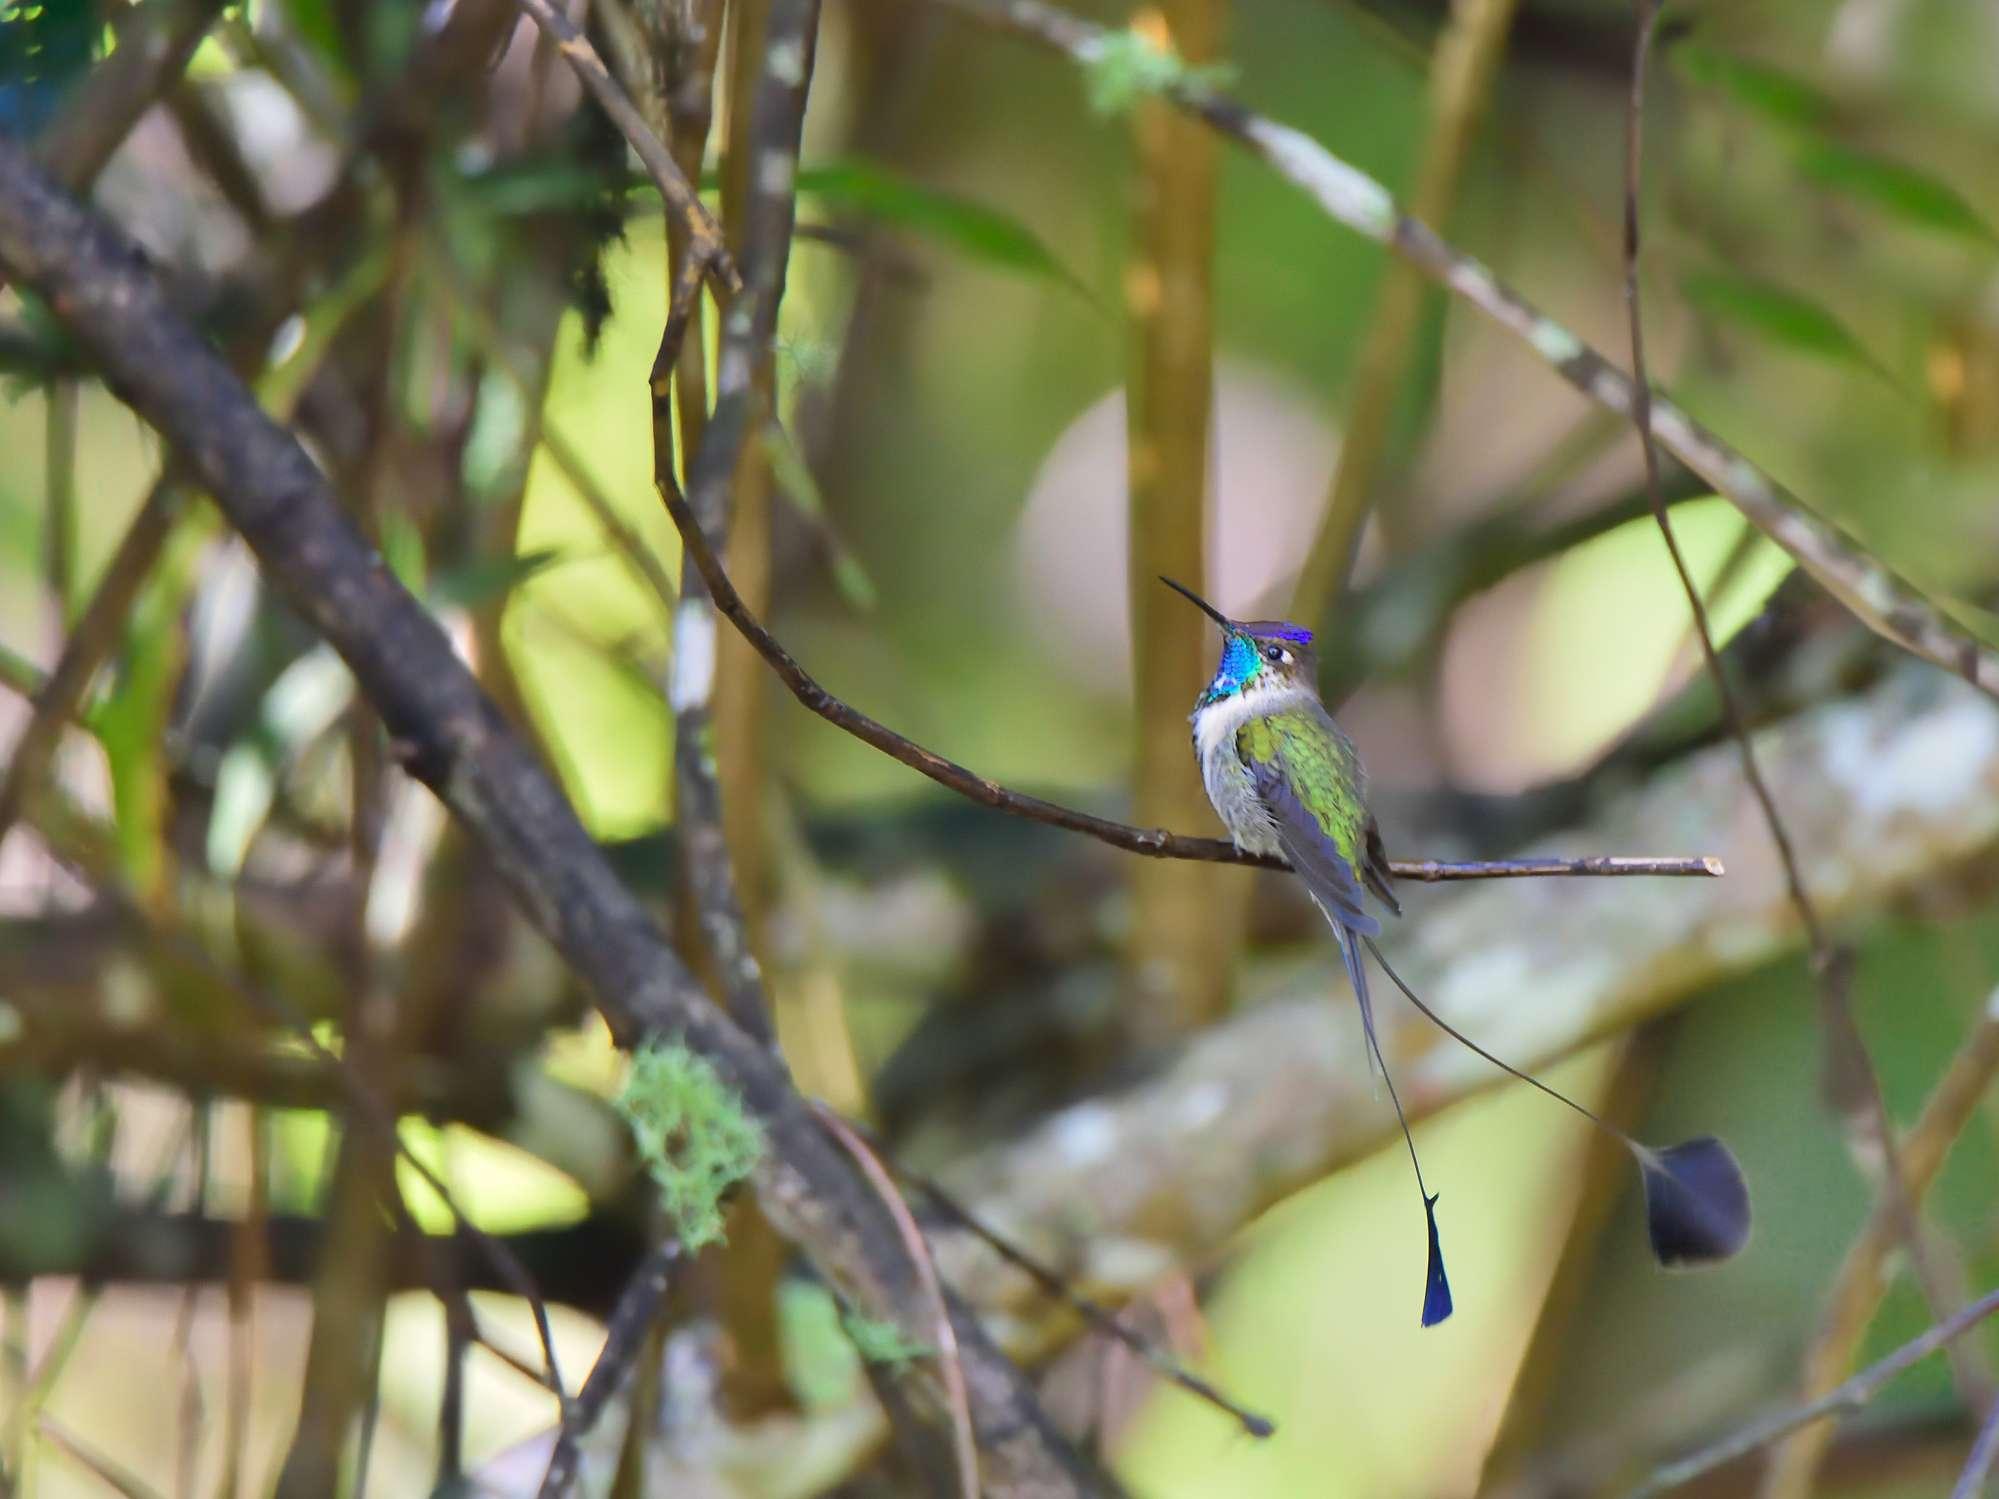 marvelous spatuletail hummingbird perches on tree branch